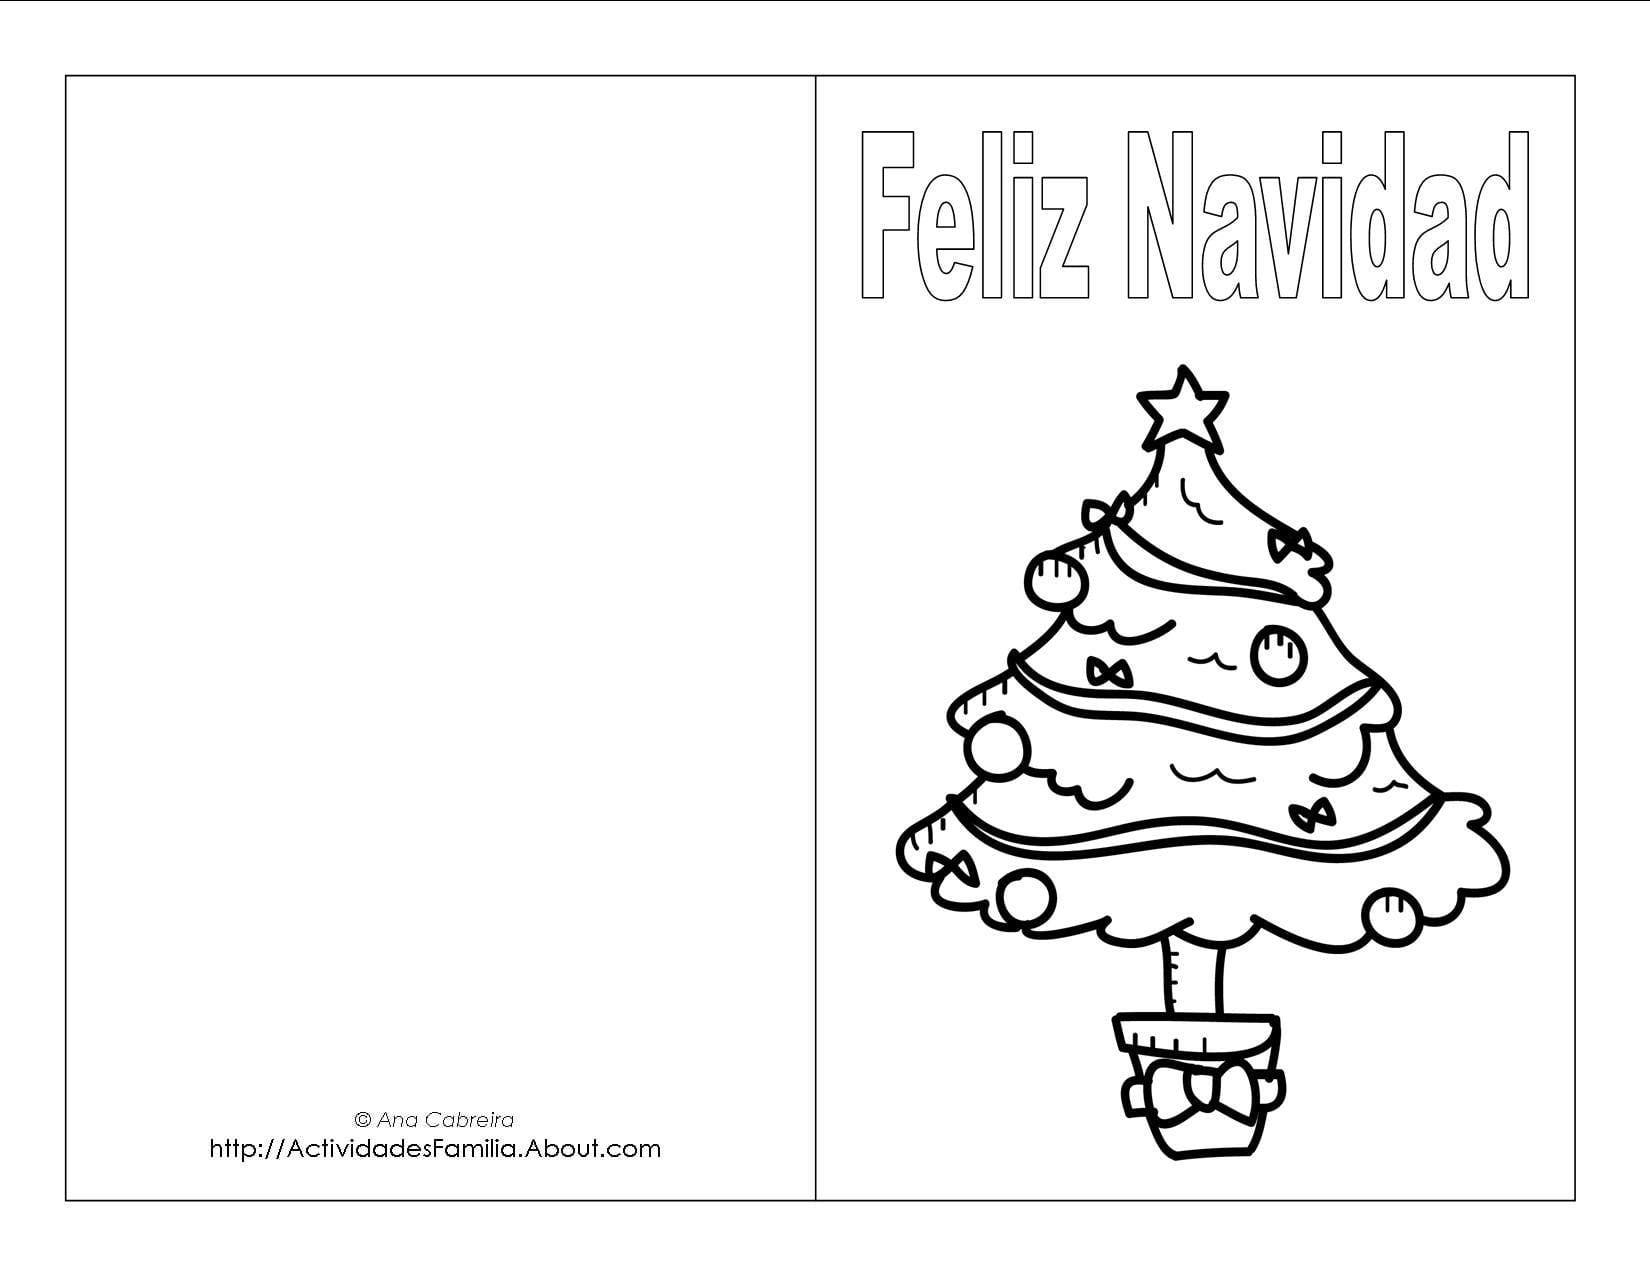 Dibujos navide os para colorear descarga gratis - Dibujos tarjetas navidenas ...